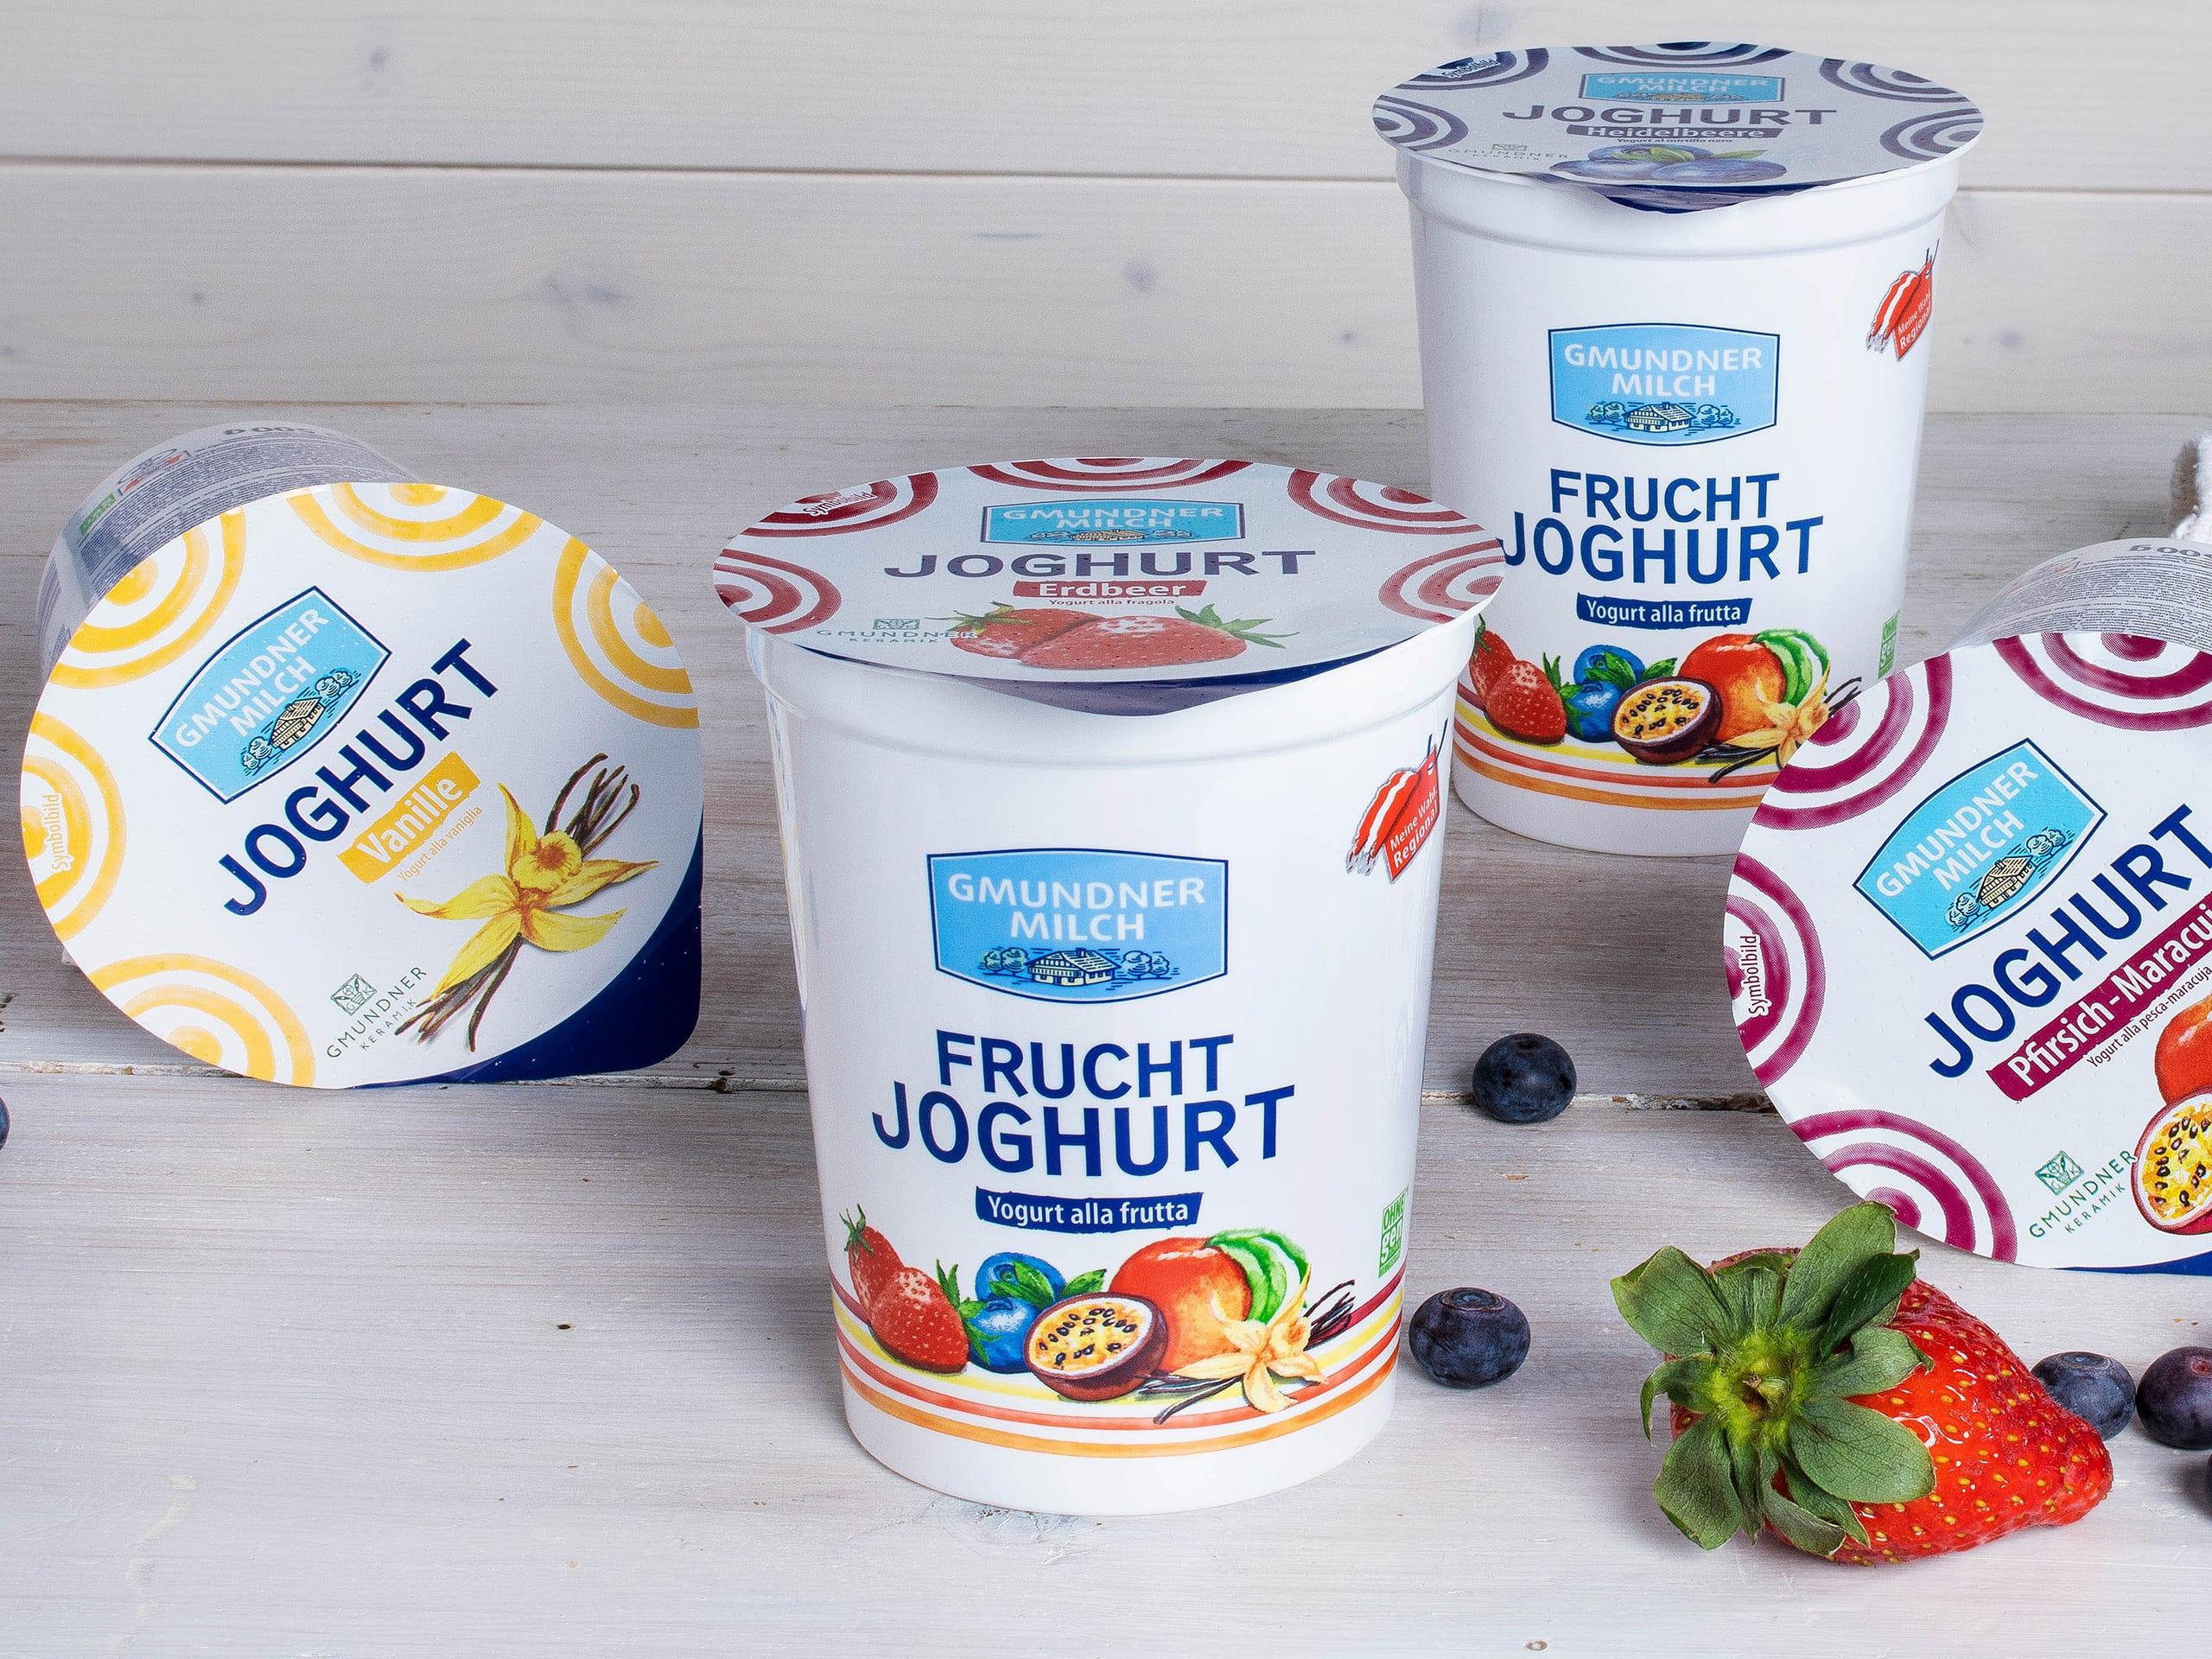 gmundner-fruchtjogurt